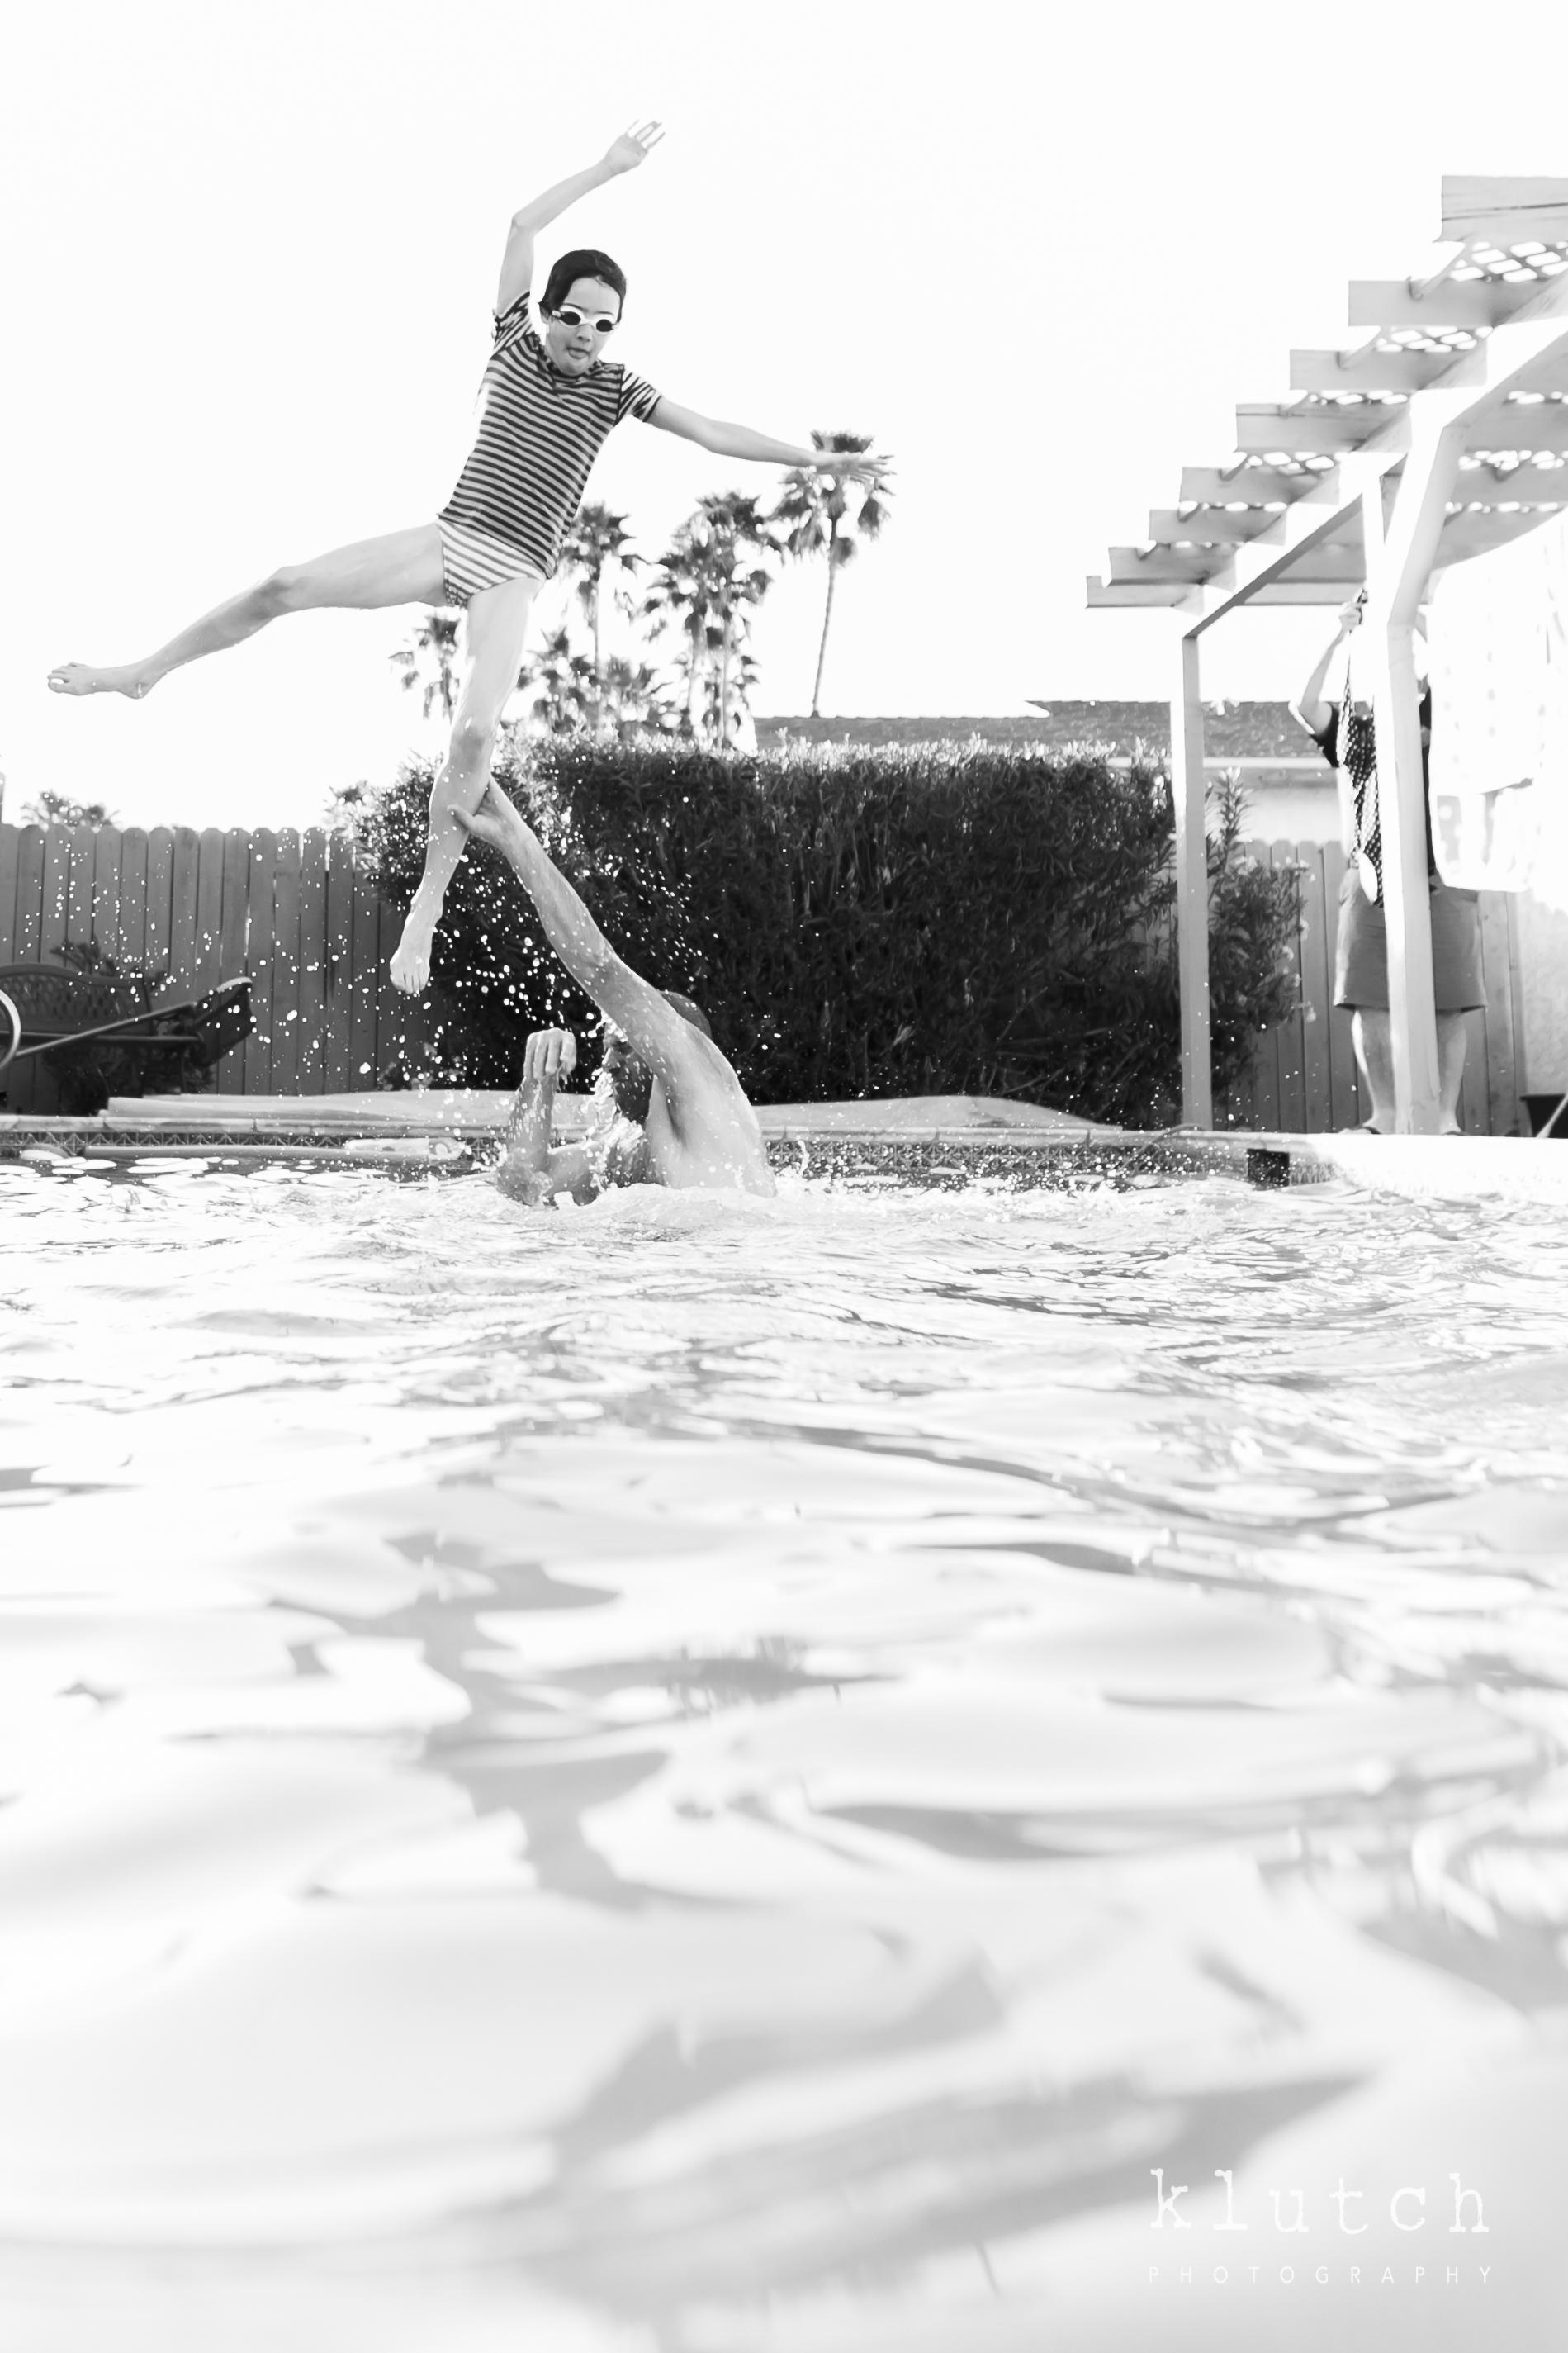 Klutch Photography,white rock family photographer, vancouver family photographer, whiterock lifestyle photographer, life unscripted photographer, life unscripted session, photography,Dina Ferreira Stoddard-9-2.jpg